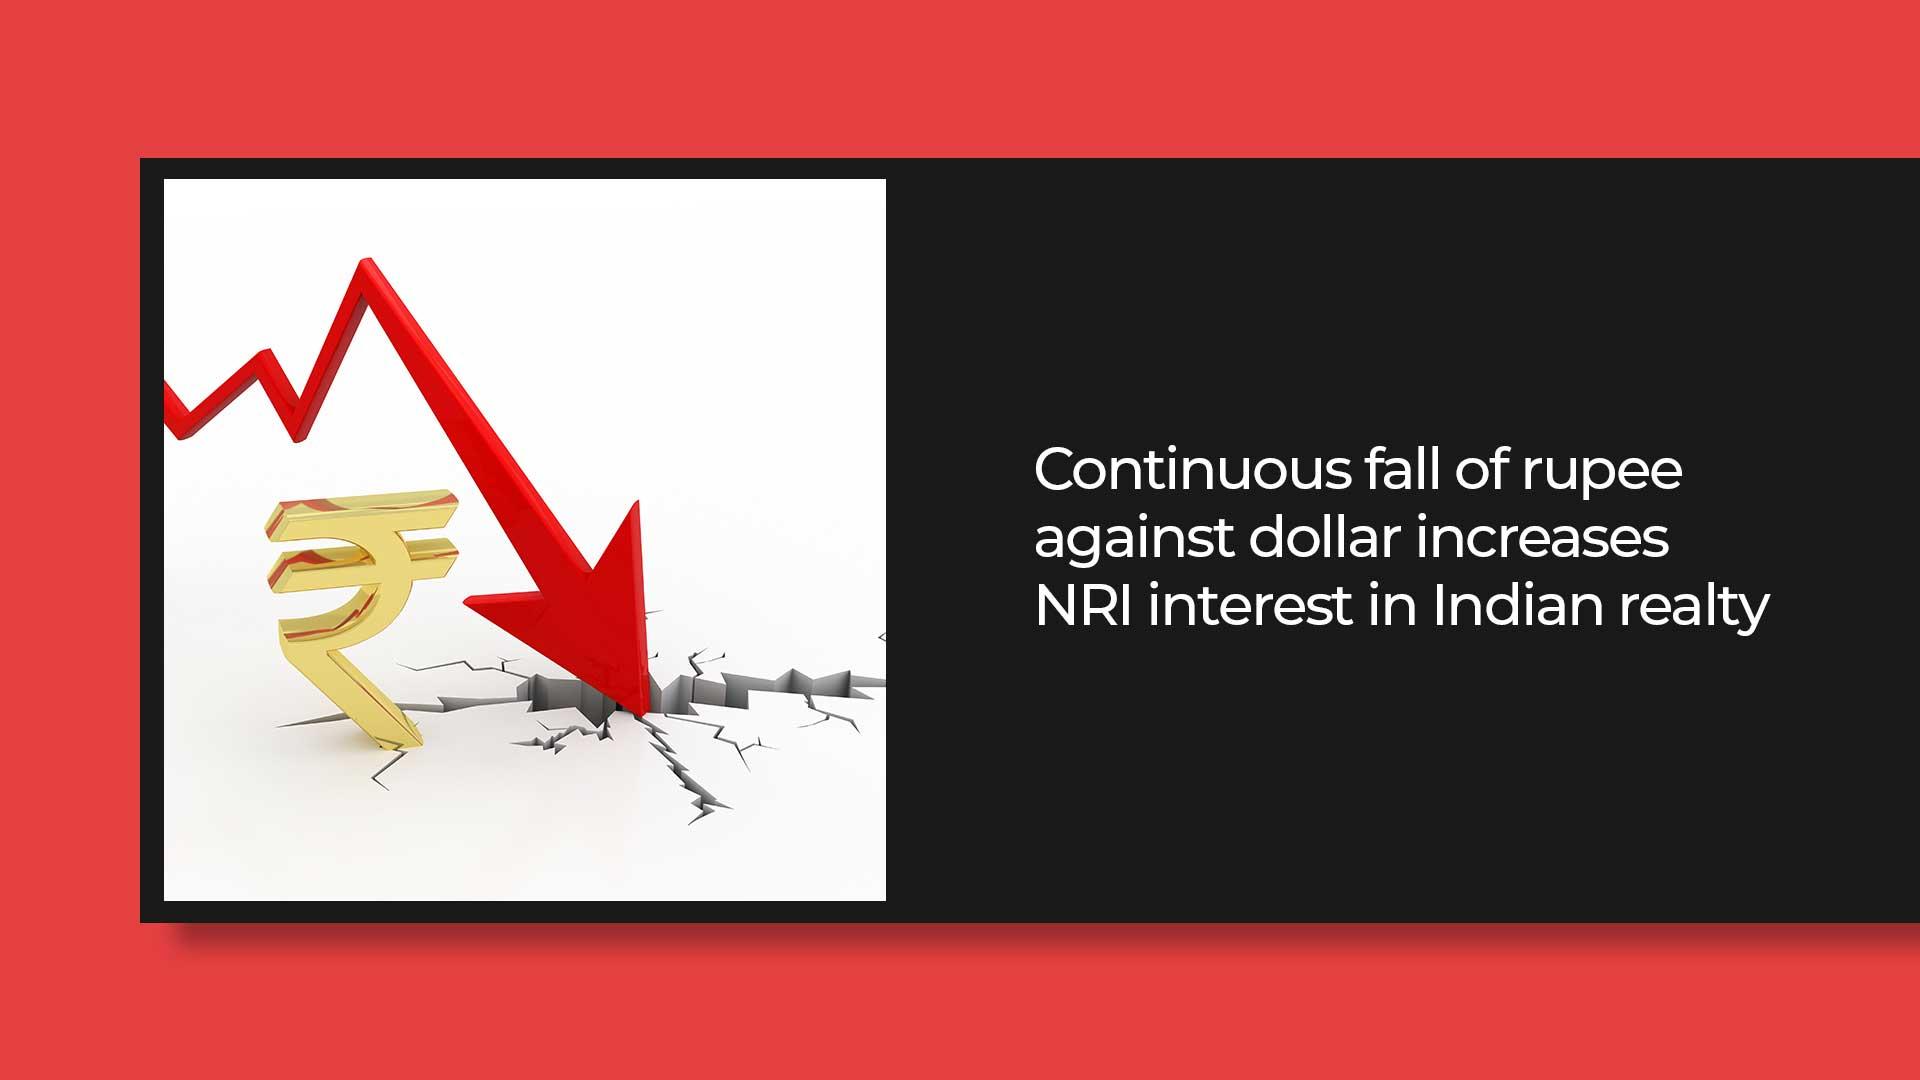 NRI Investors Flock To India's Real Estate As The Rupee Weakens